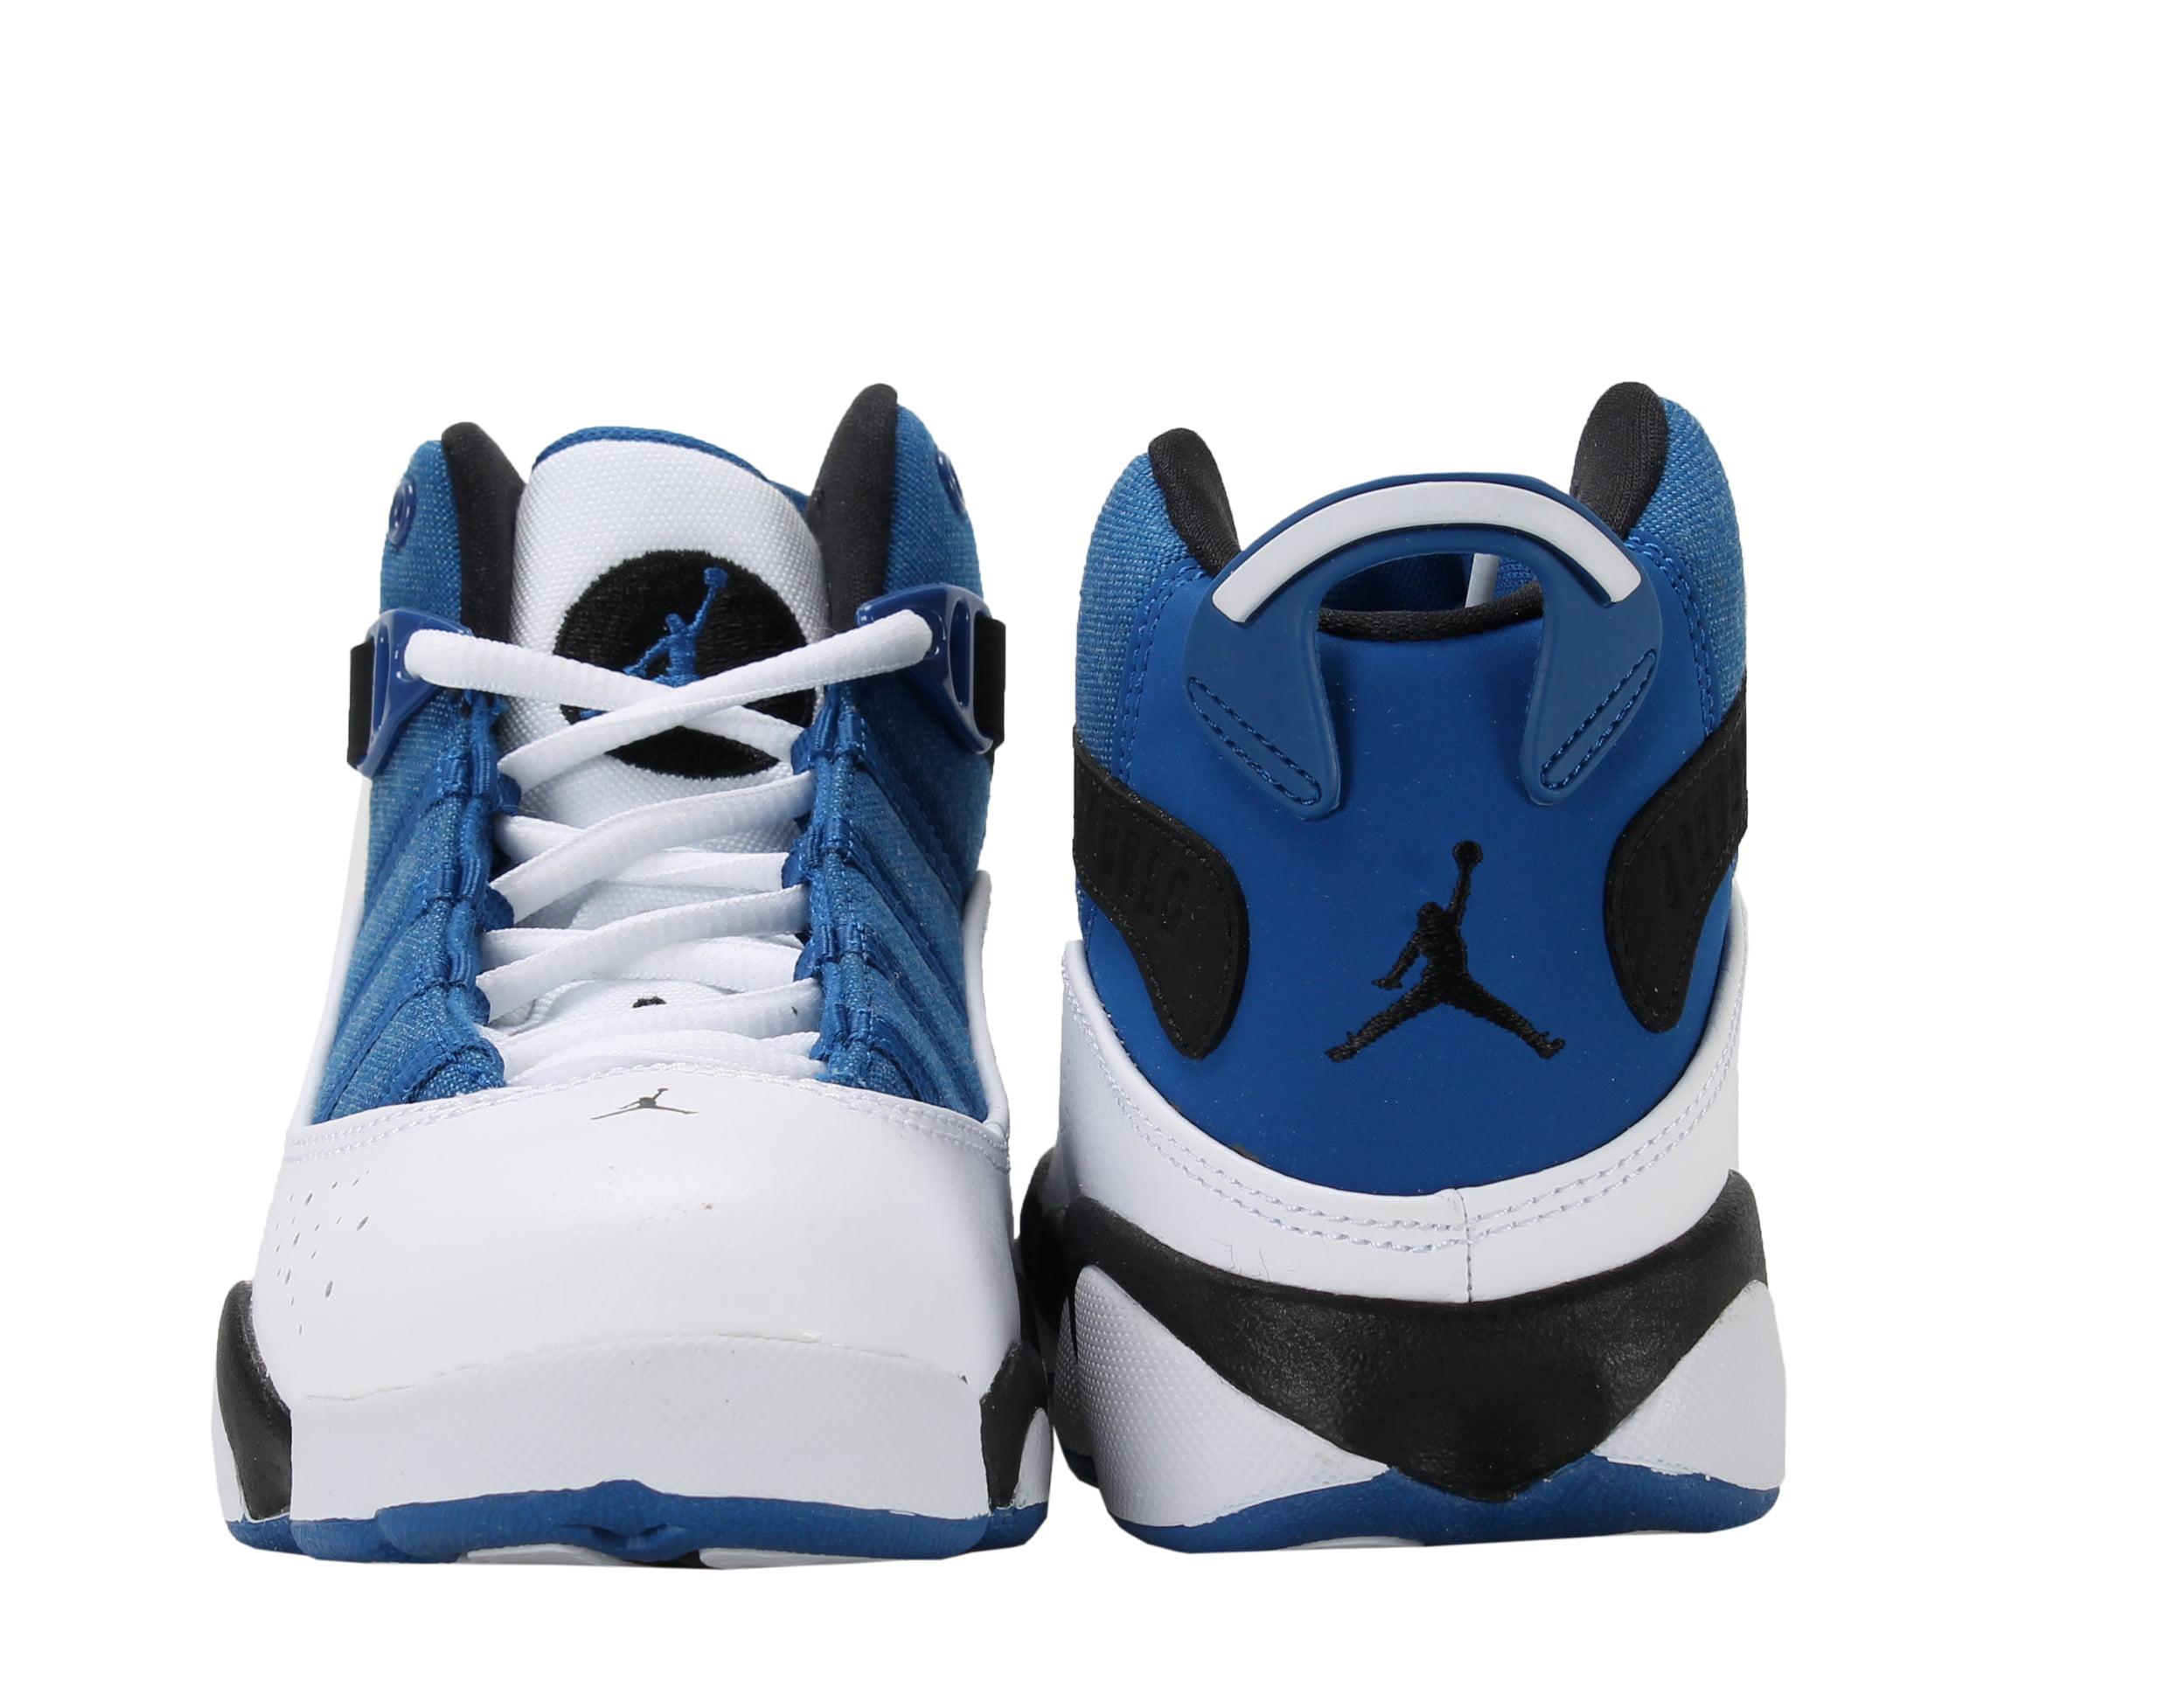 626a7aee8da1d4 Jordan - Nike Air Jordan 6 Rings BP Blue Blk-Wht Little Kids Basketball  Shoes 323432-400 - Walmart.com